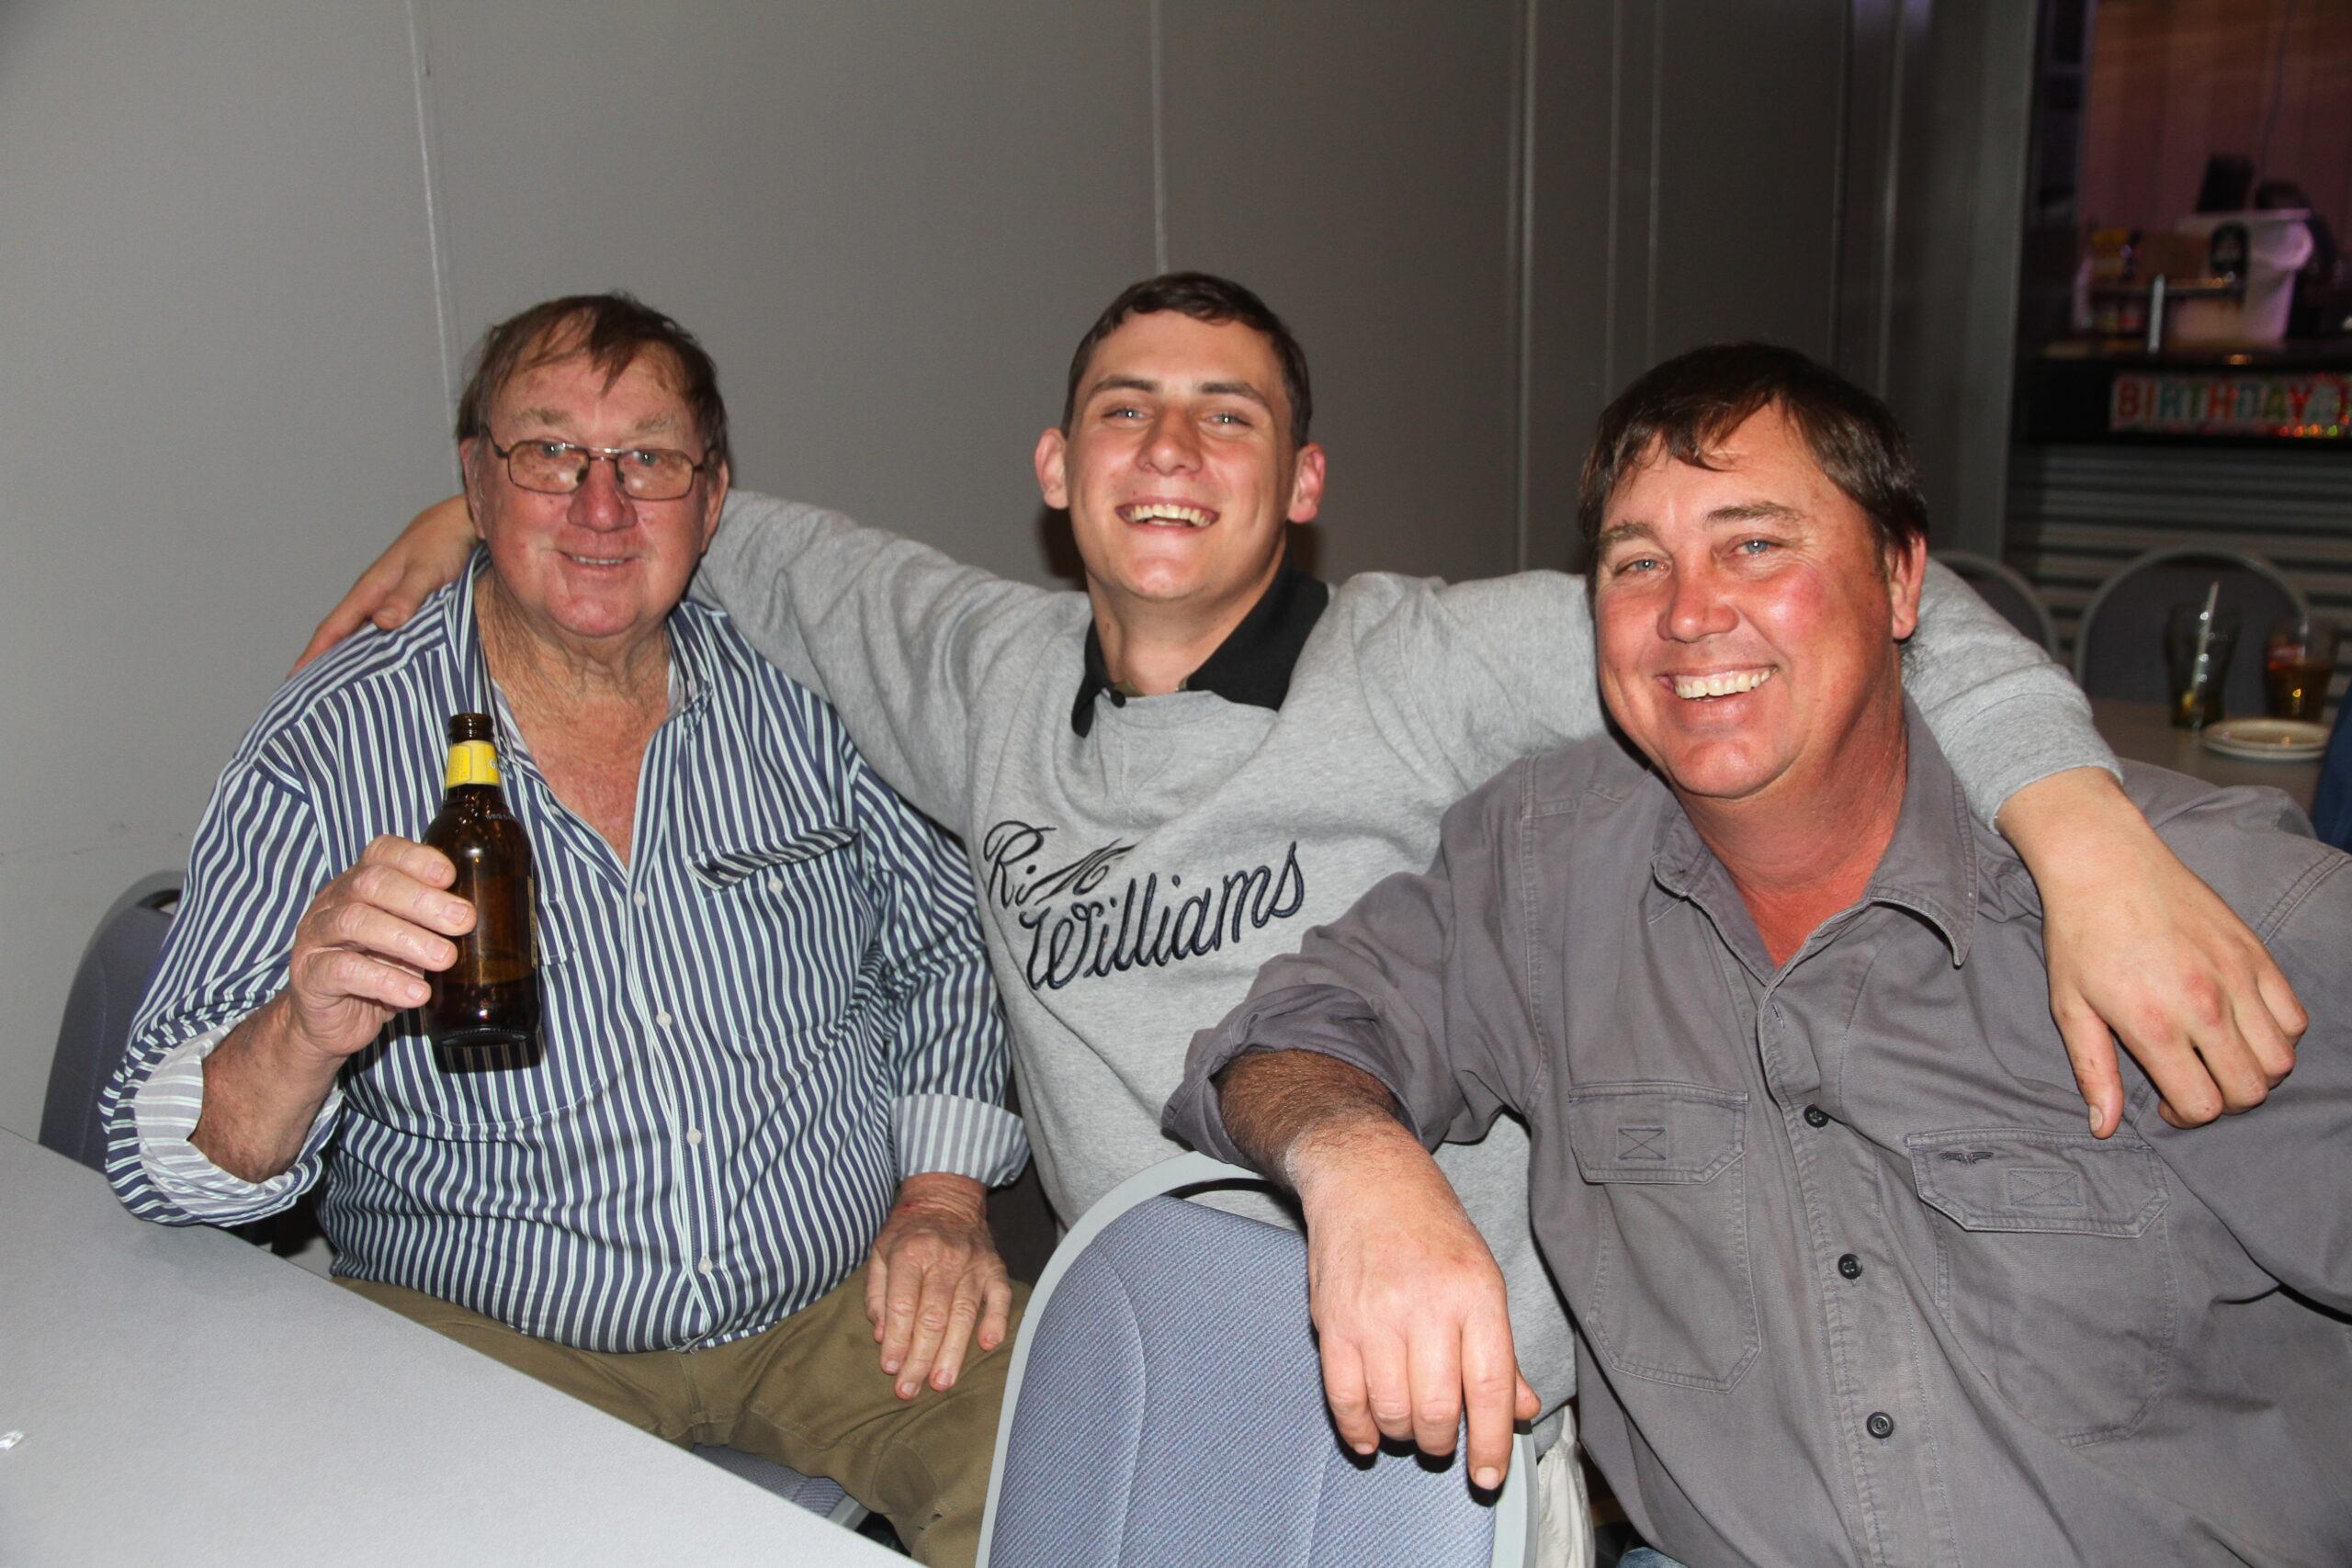 Chris Dickinson, Jacob Druce and Clayton Dickinson.